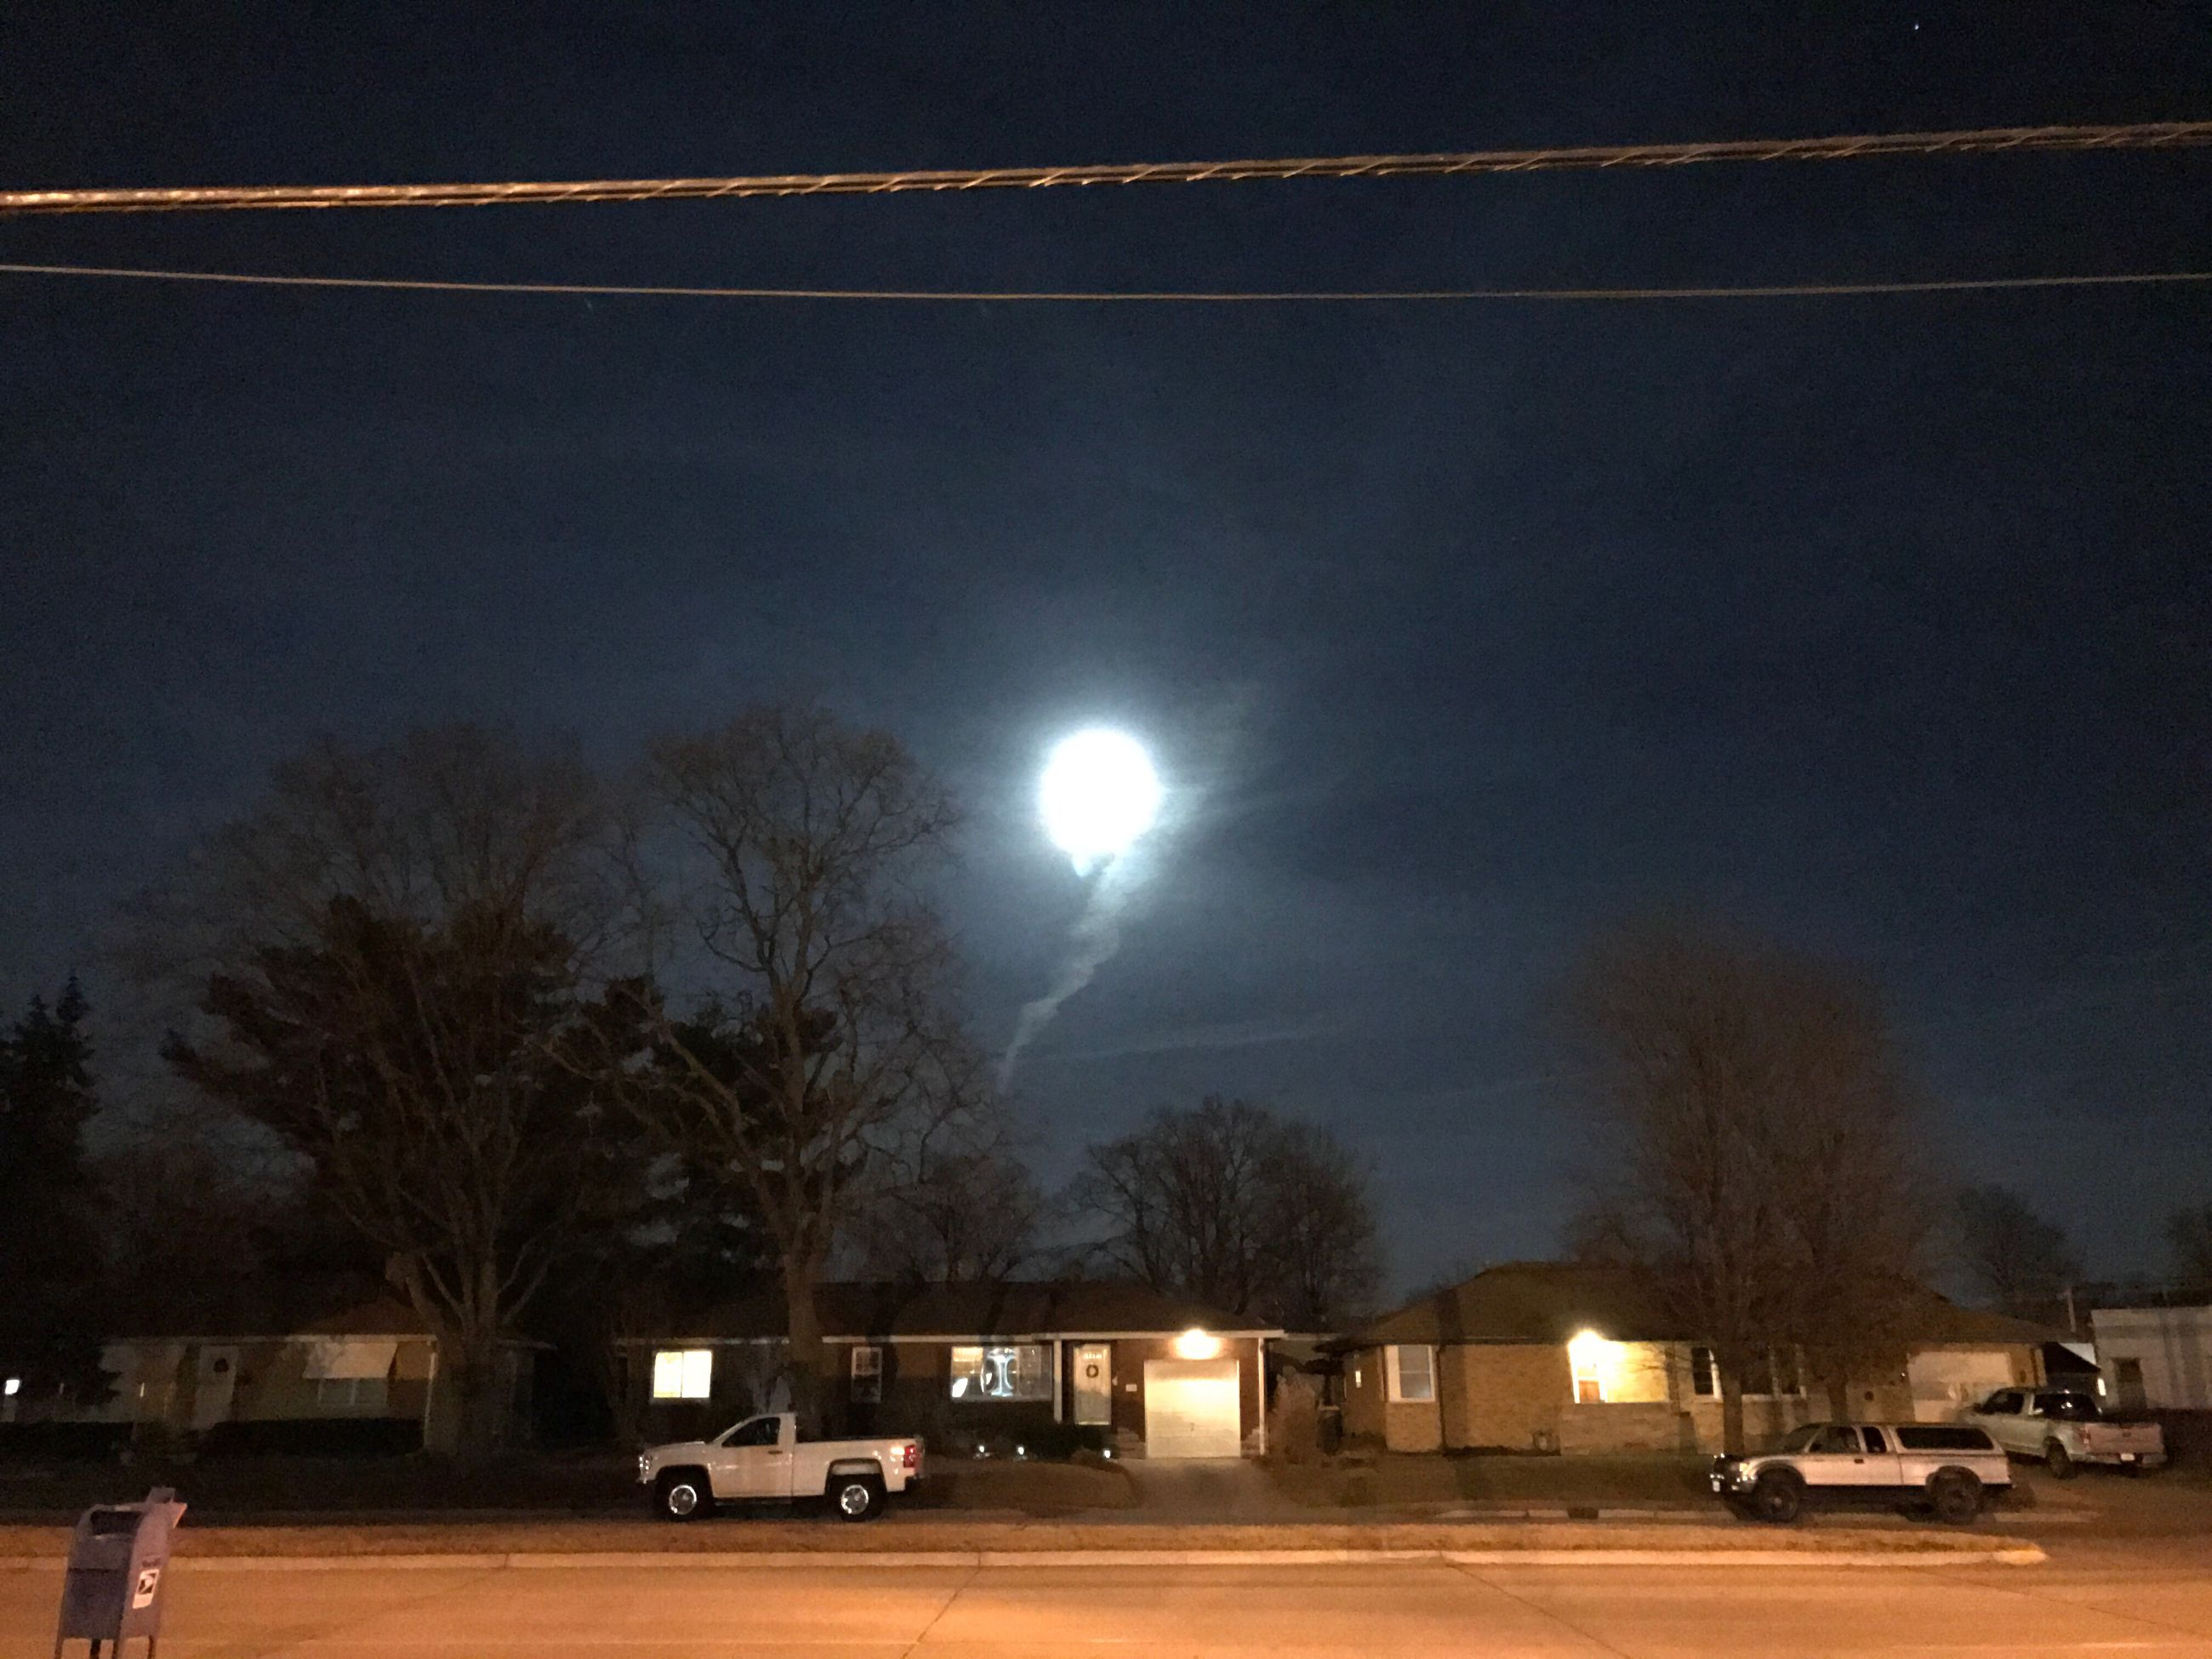 night, illuminated, sky, tree, moon, outdoors, no people, astronomy